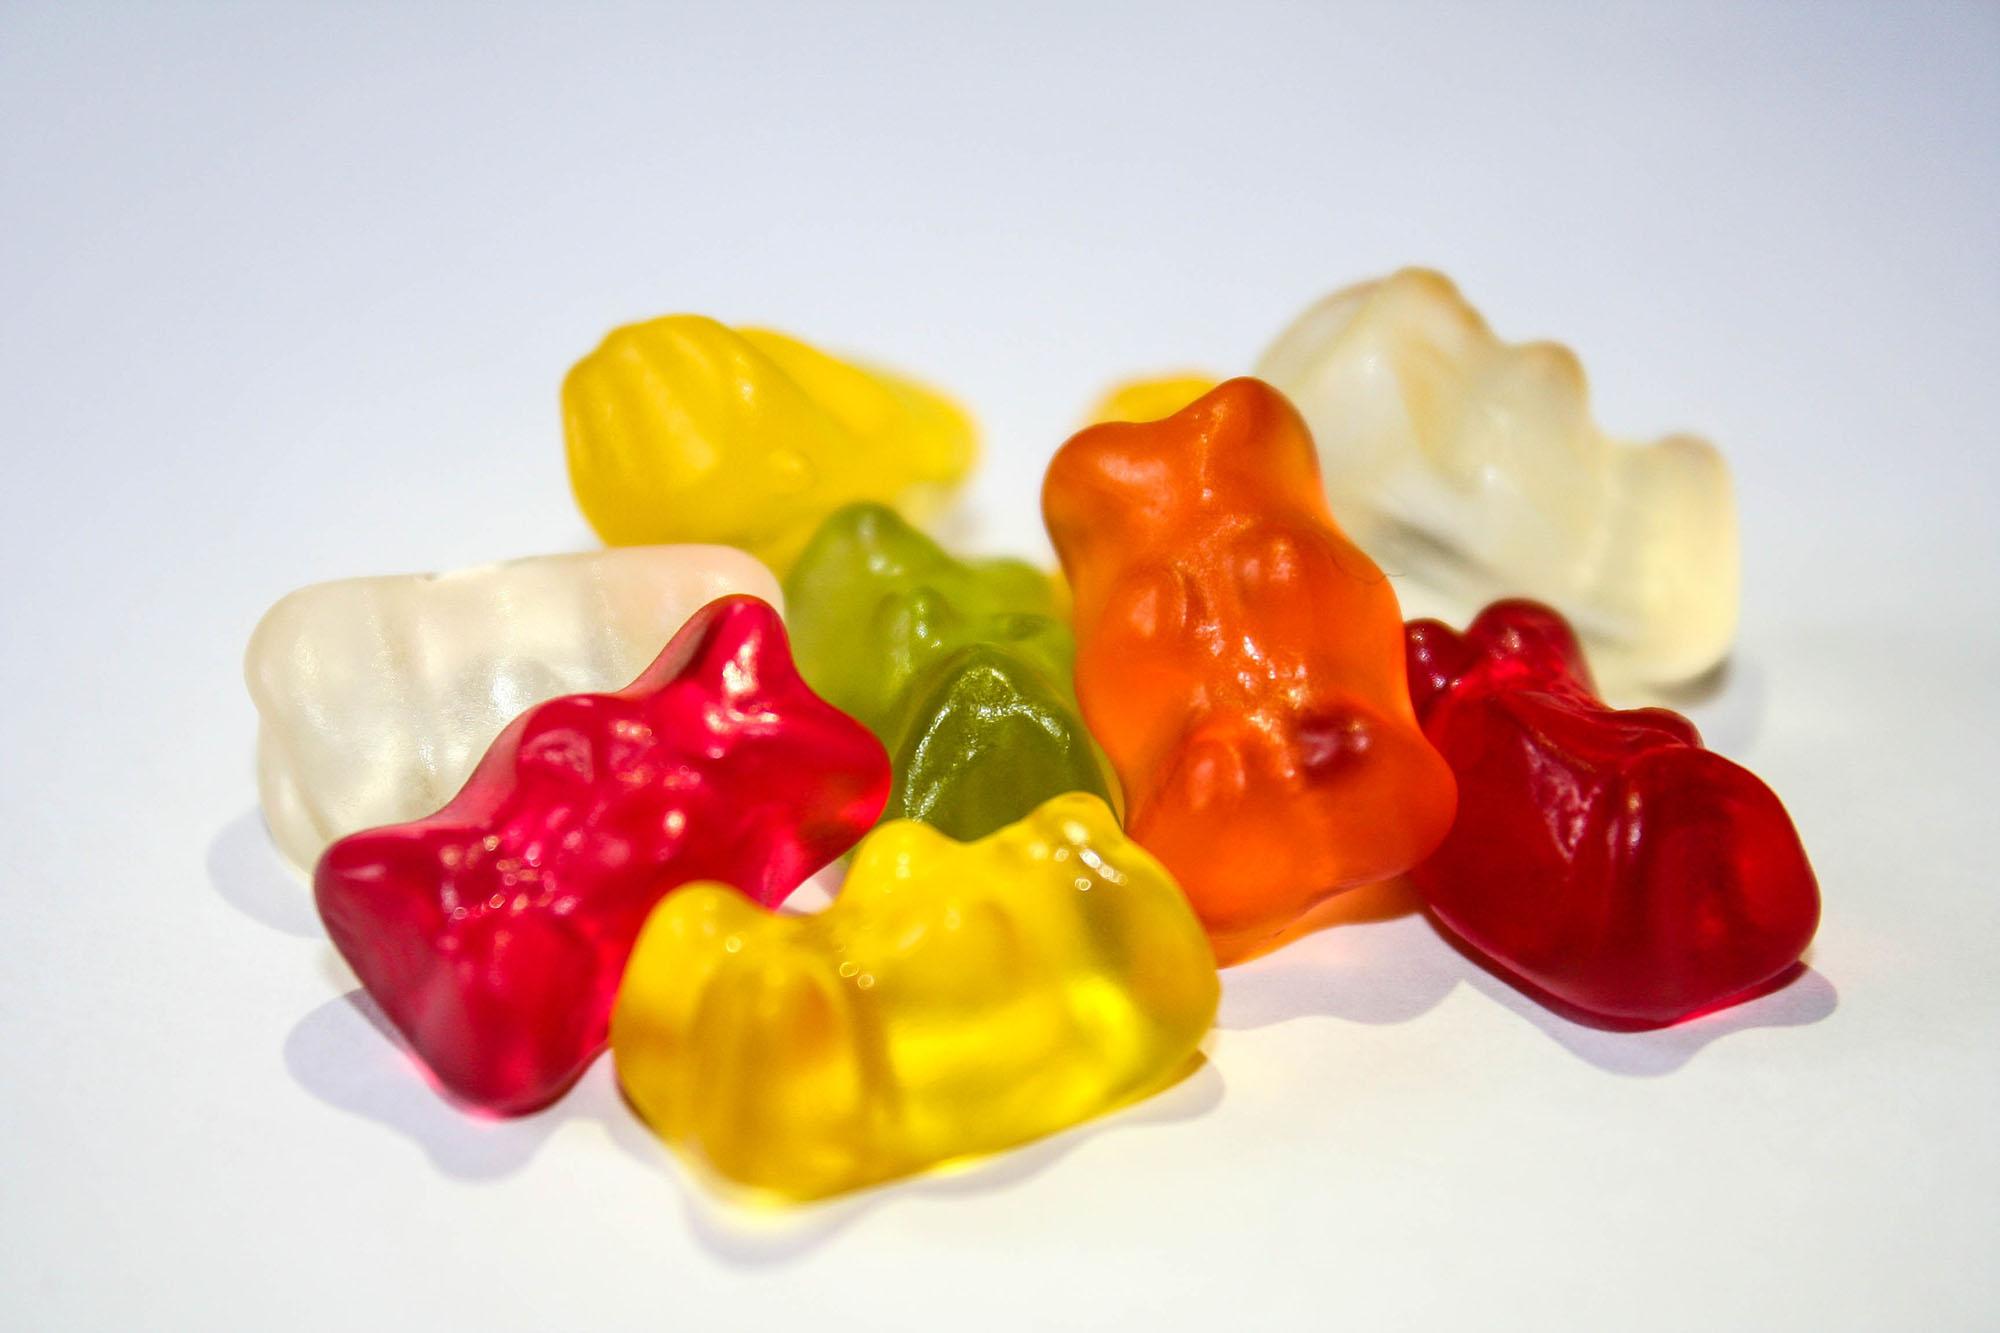 gummibarchen-color-candy-nibble-51352.jpeg